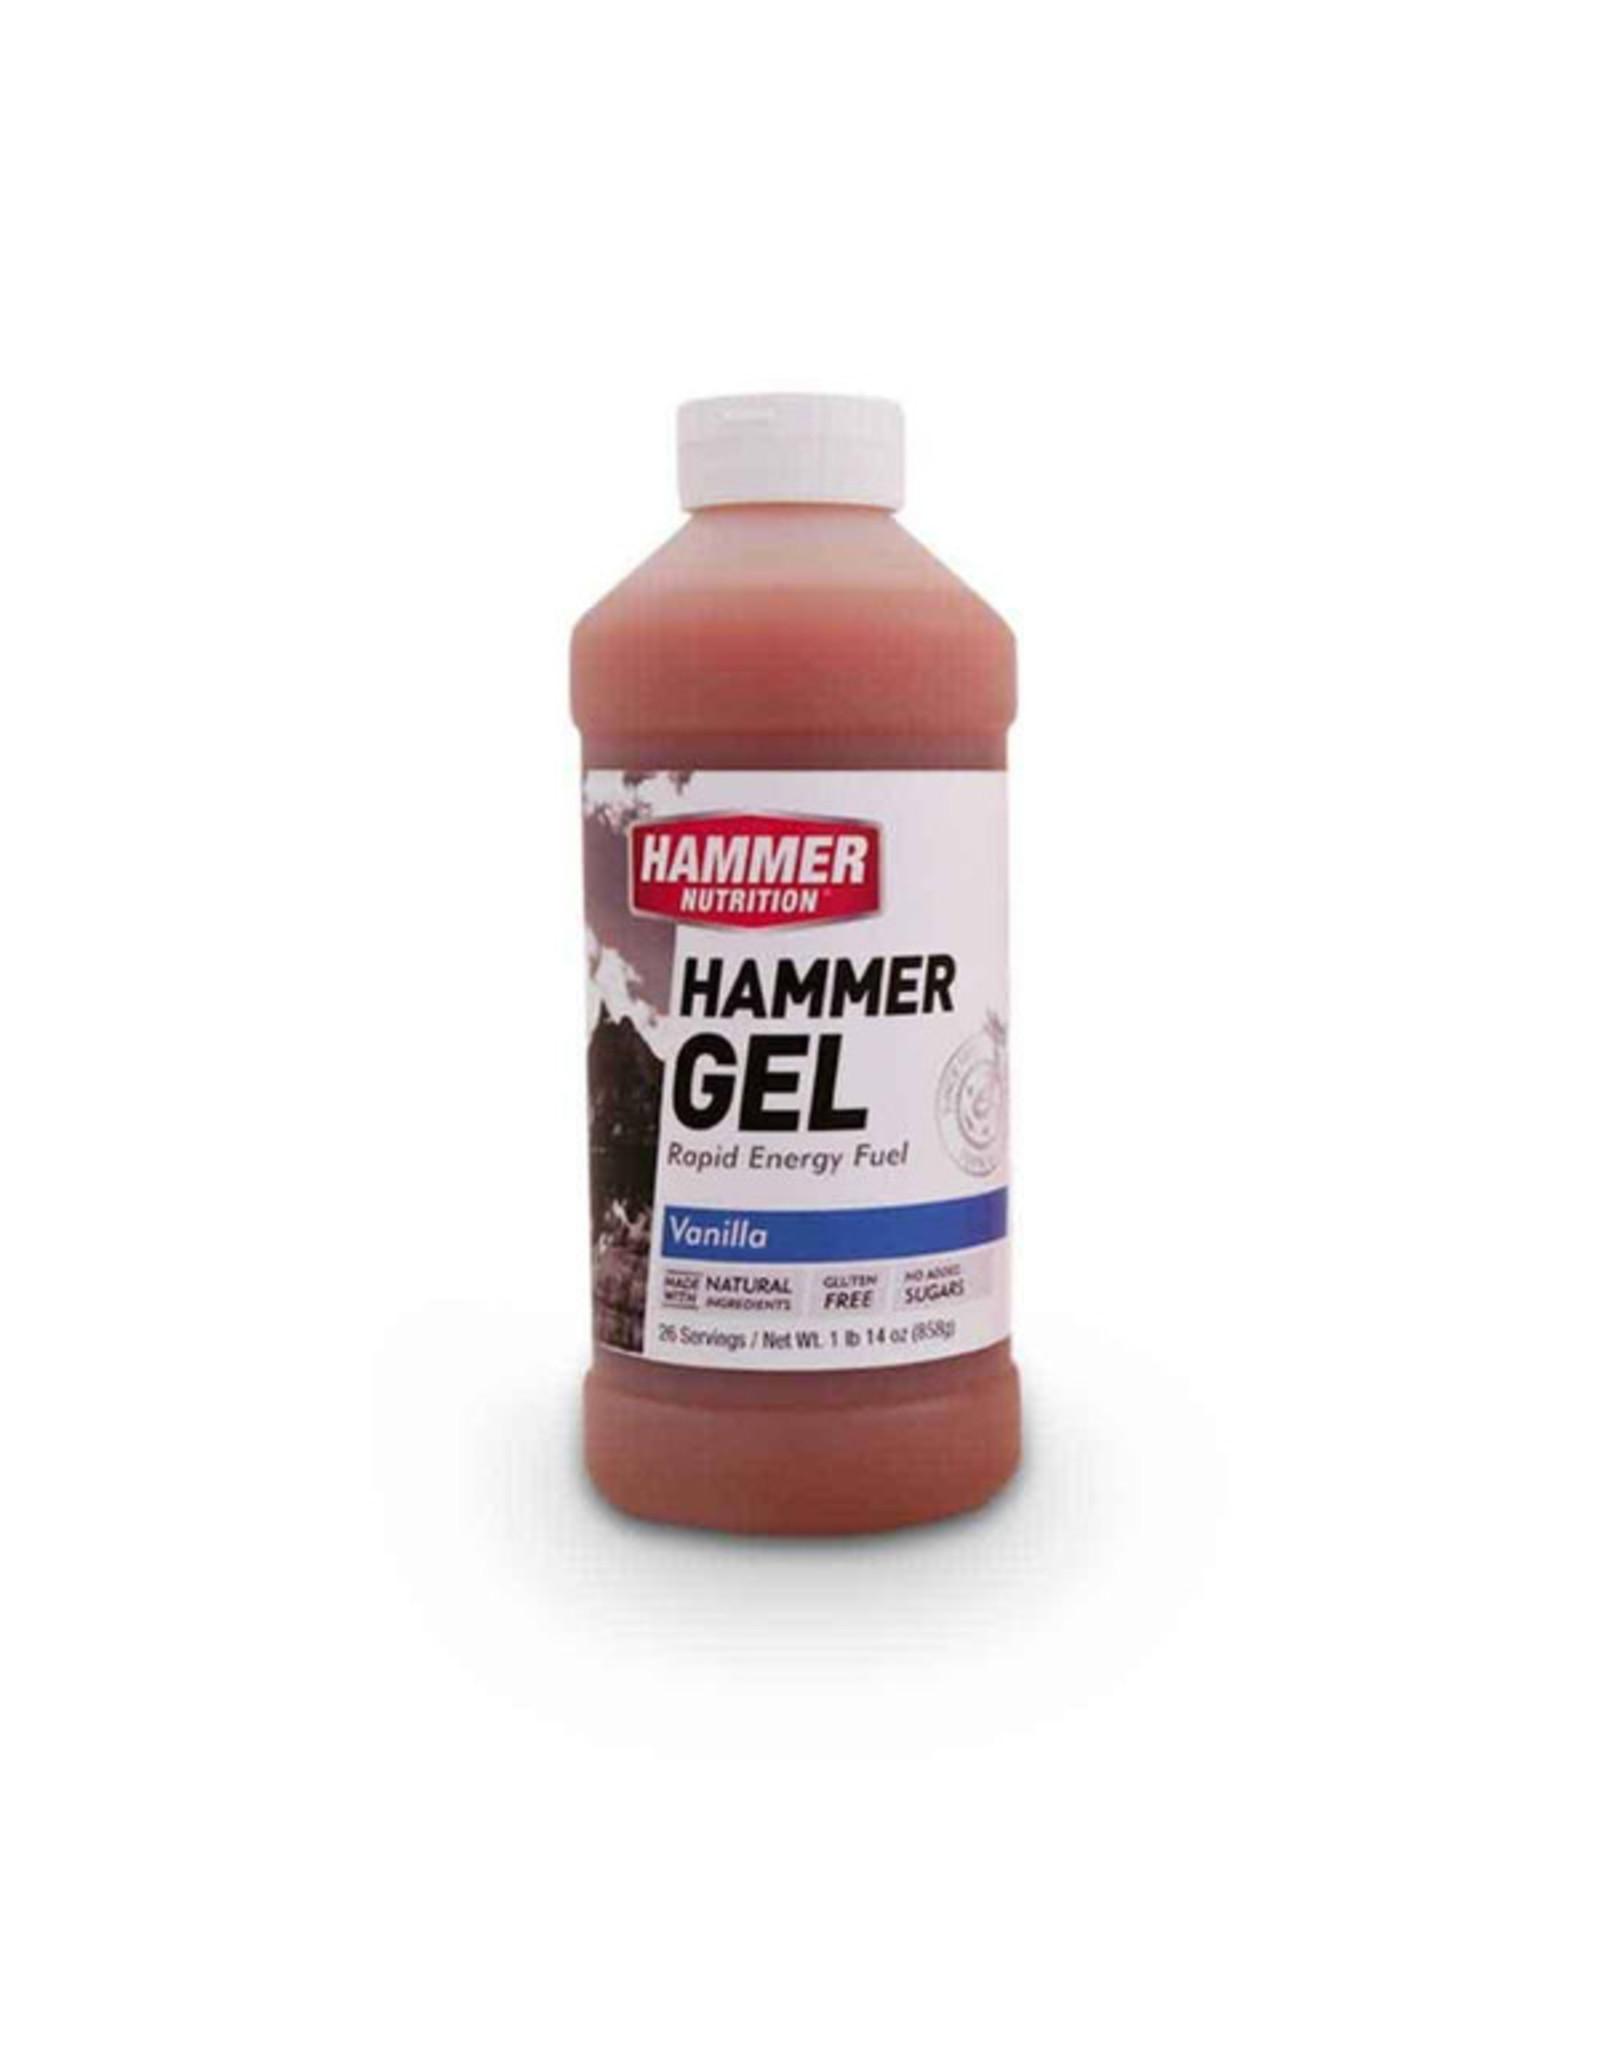 Hammer Nutrition Hammer Nutrition Gel Bottle